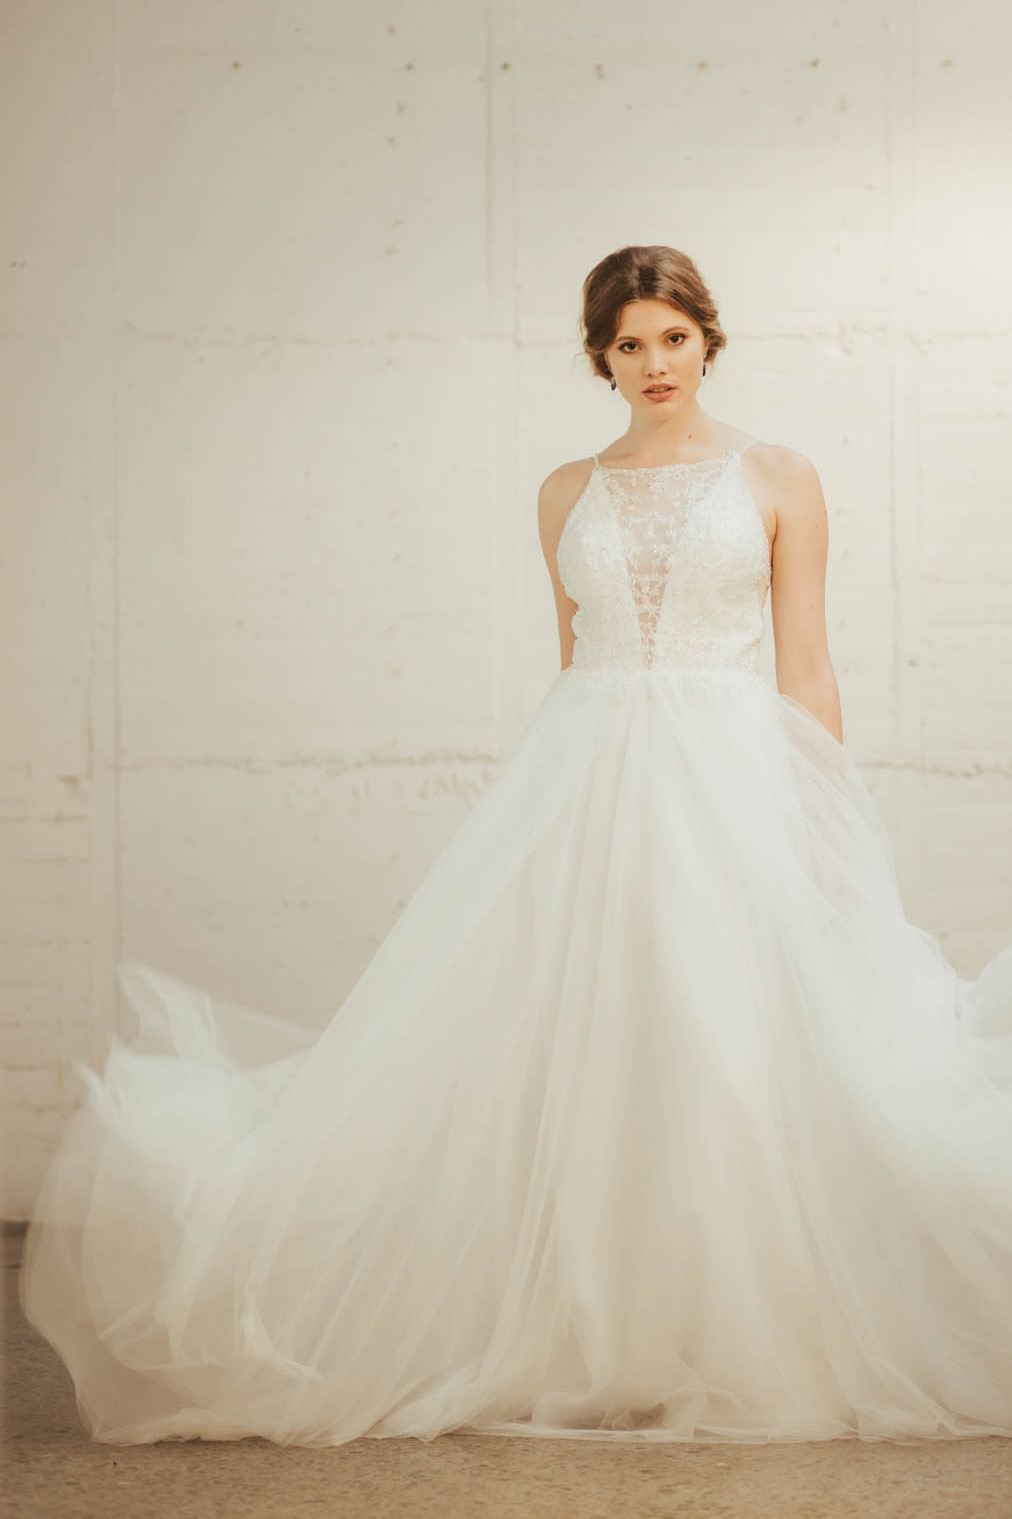 Lainee Hermsen Wedding Dresses- Paperswan Bride - Wedding Dress Shop Wellington - Christchurch